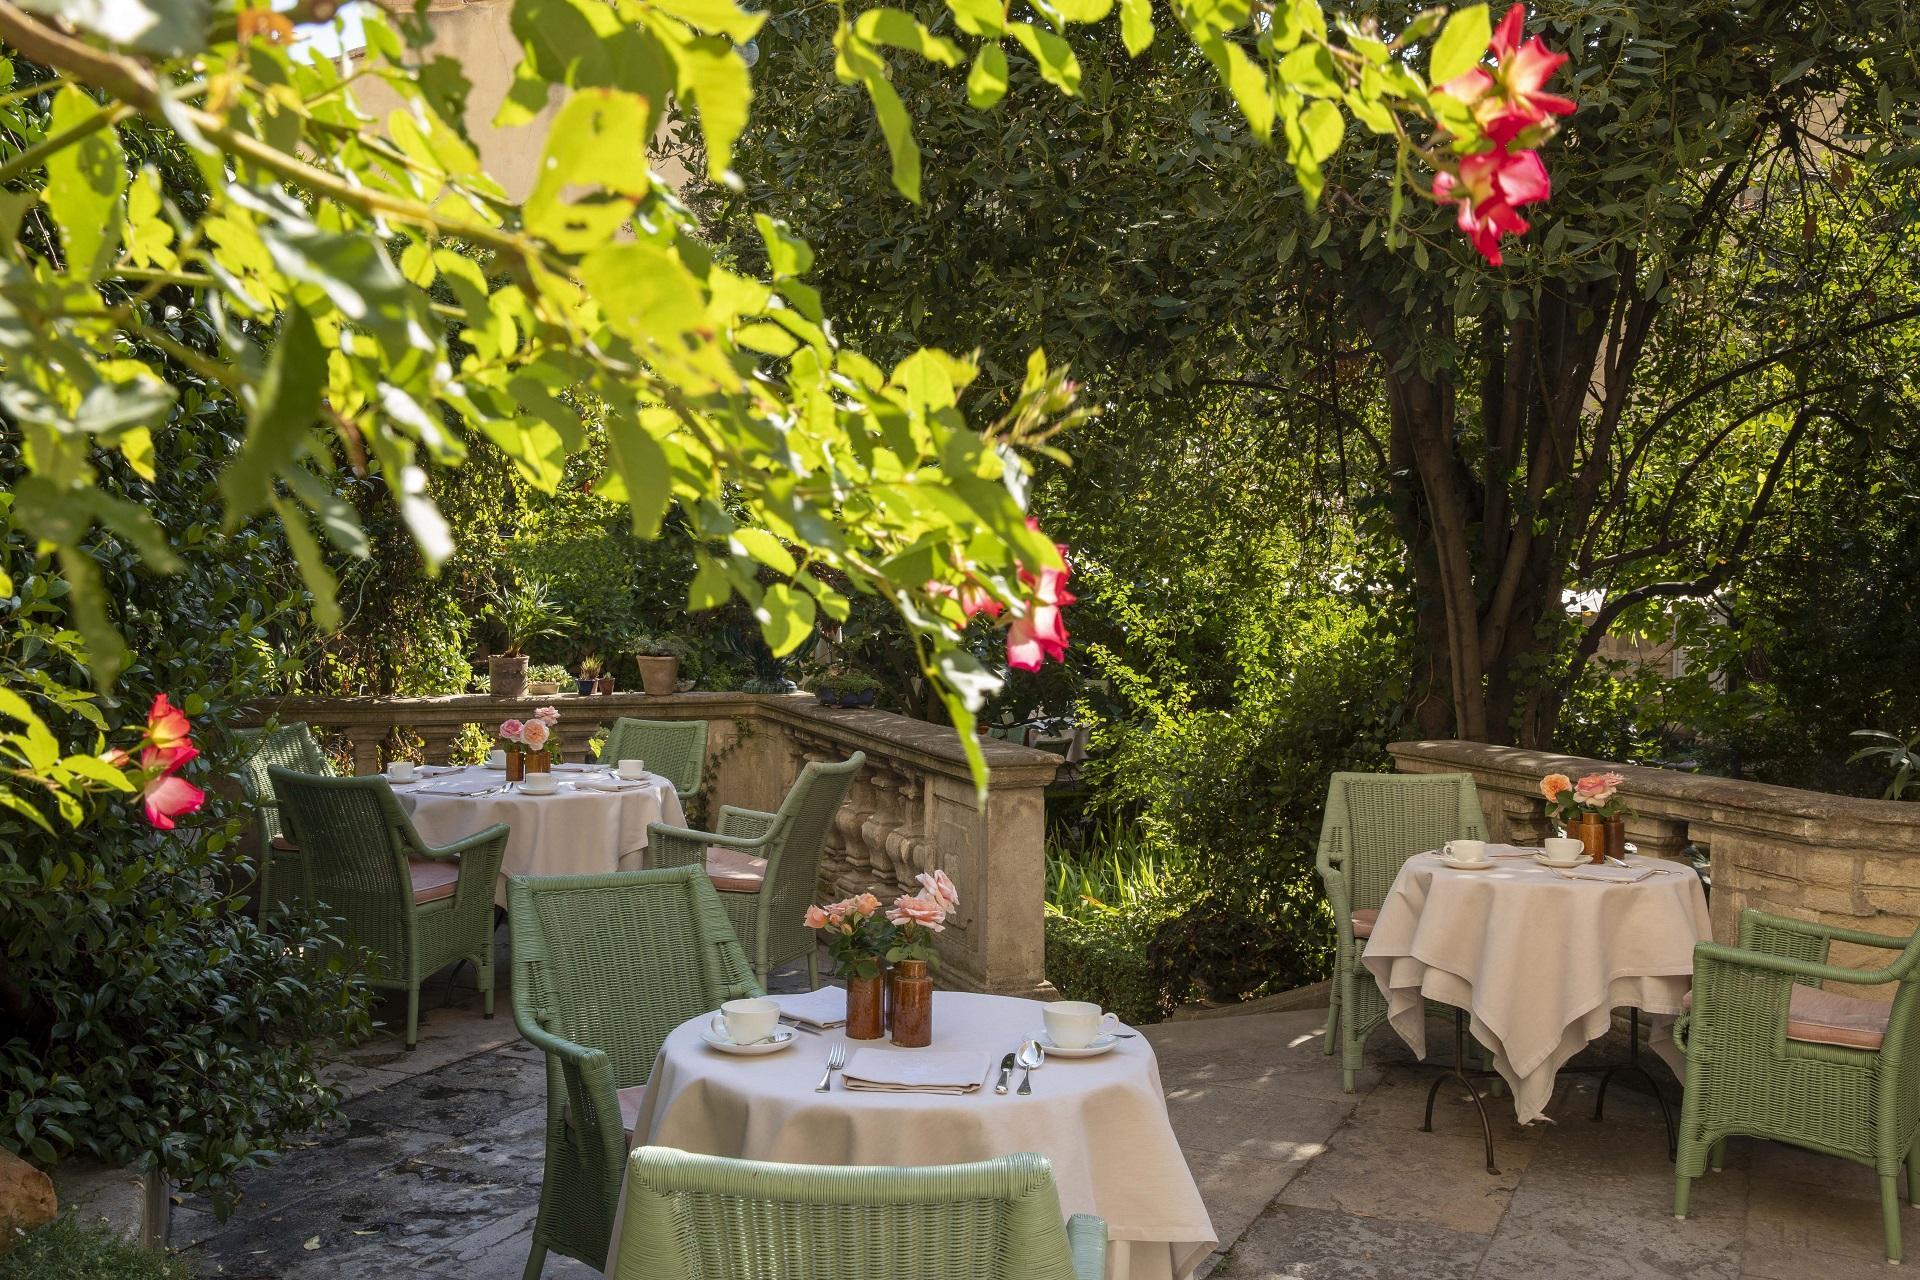 la-mirande-avignon-provence-luberon-reunion-seminaires-de-caractere-jardins